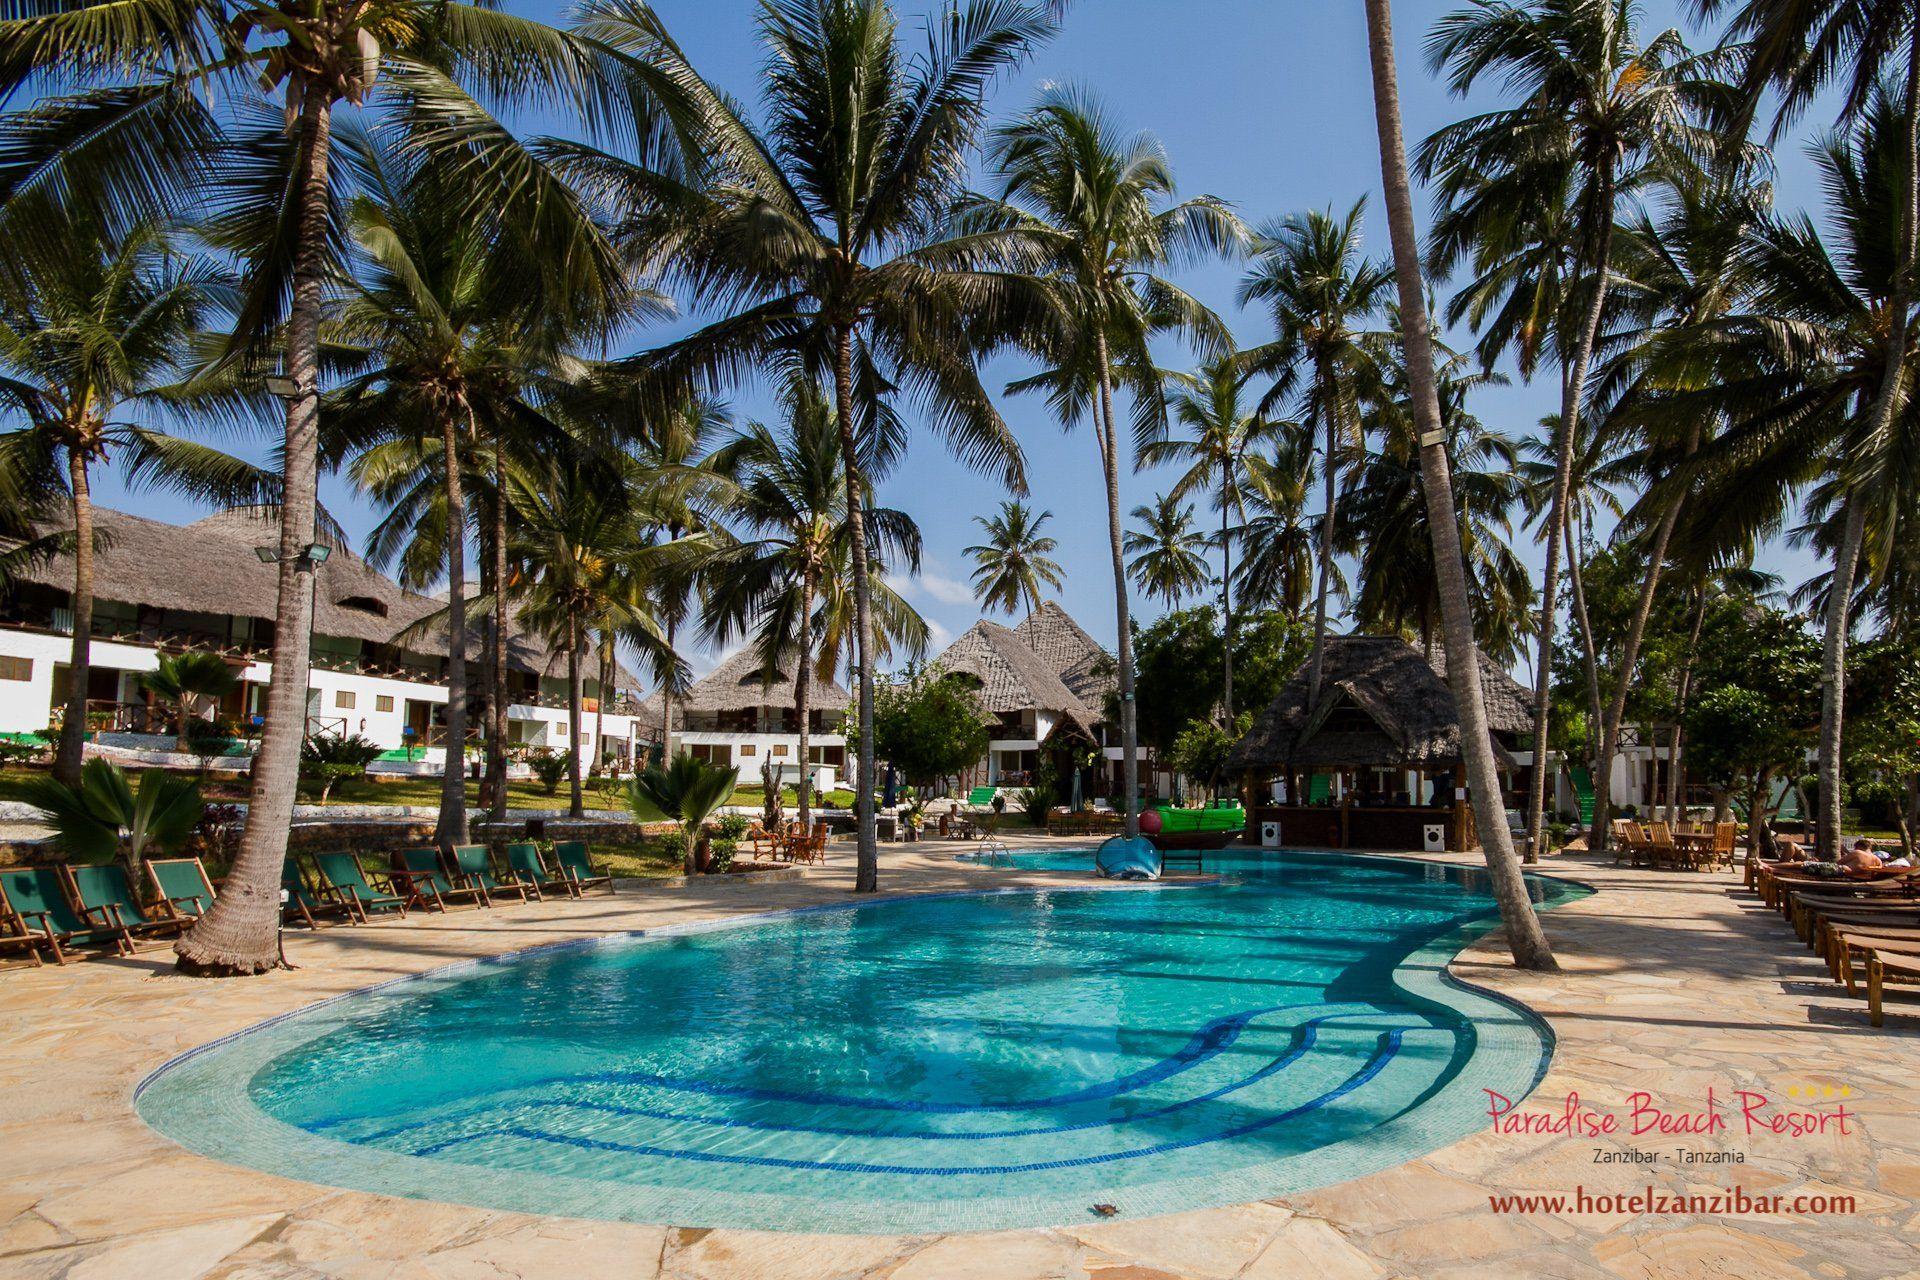 Paradise beach Resort (Zanzibar Island, Tanzania) - Reviews ...